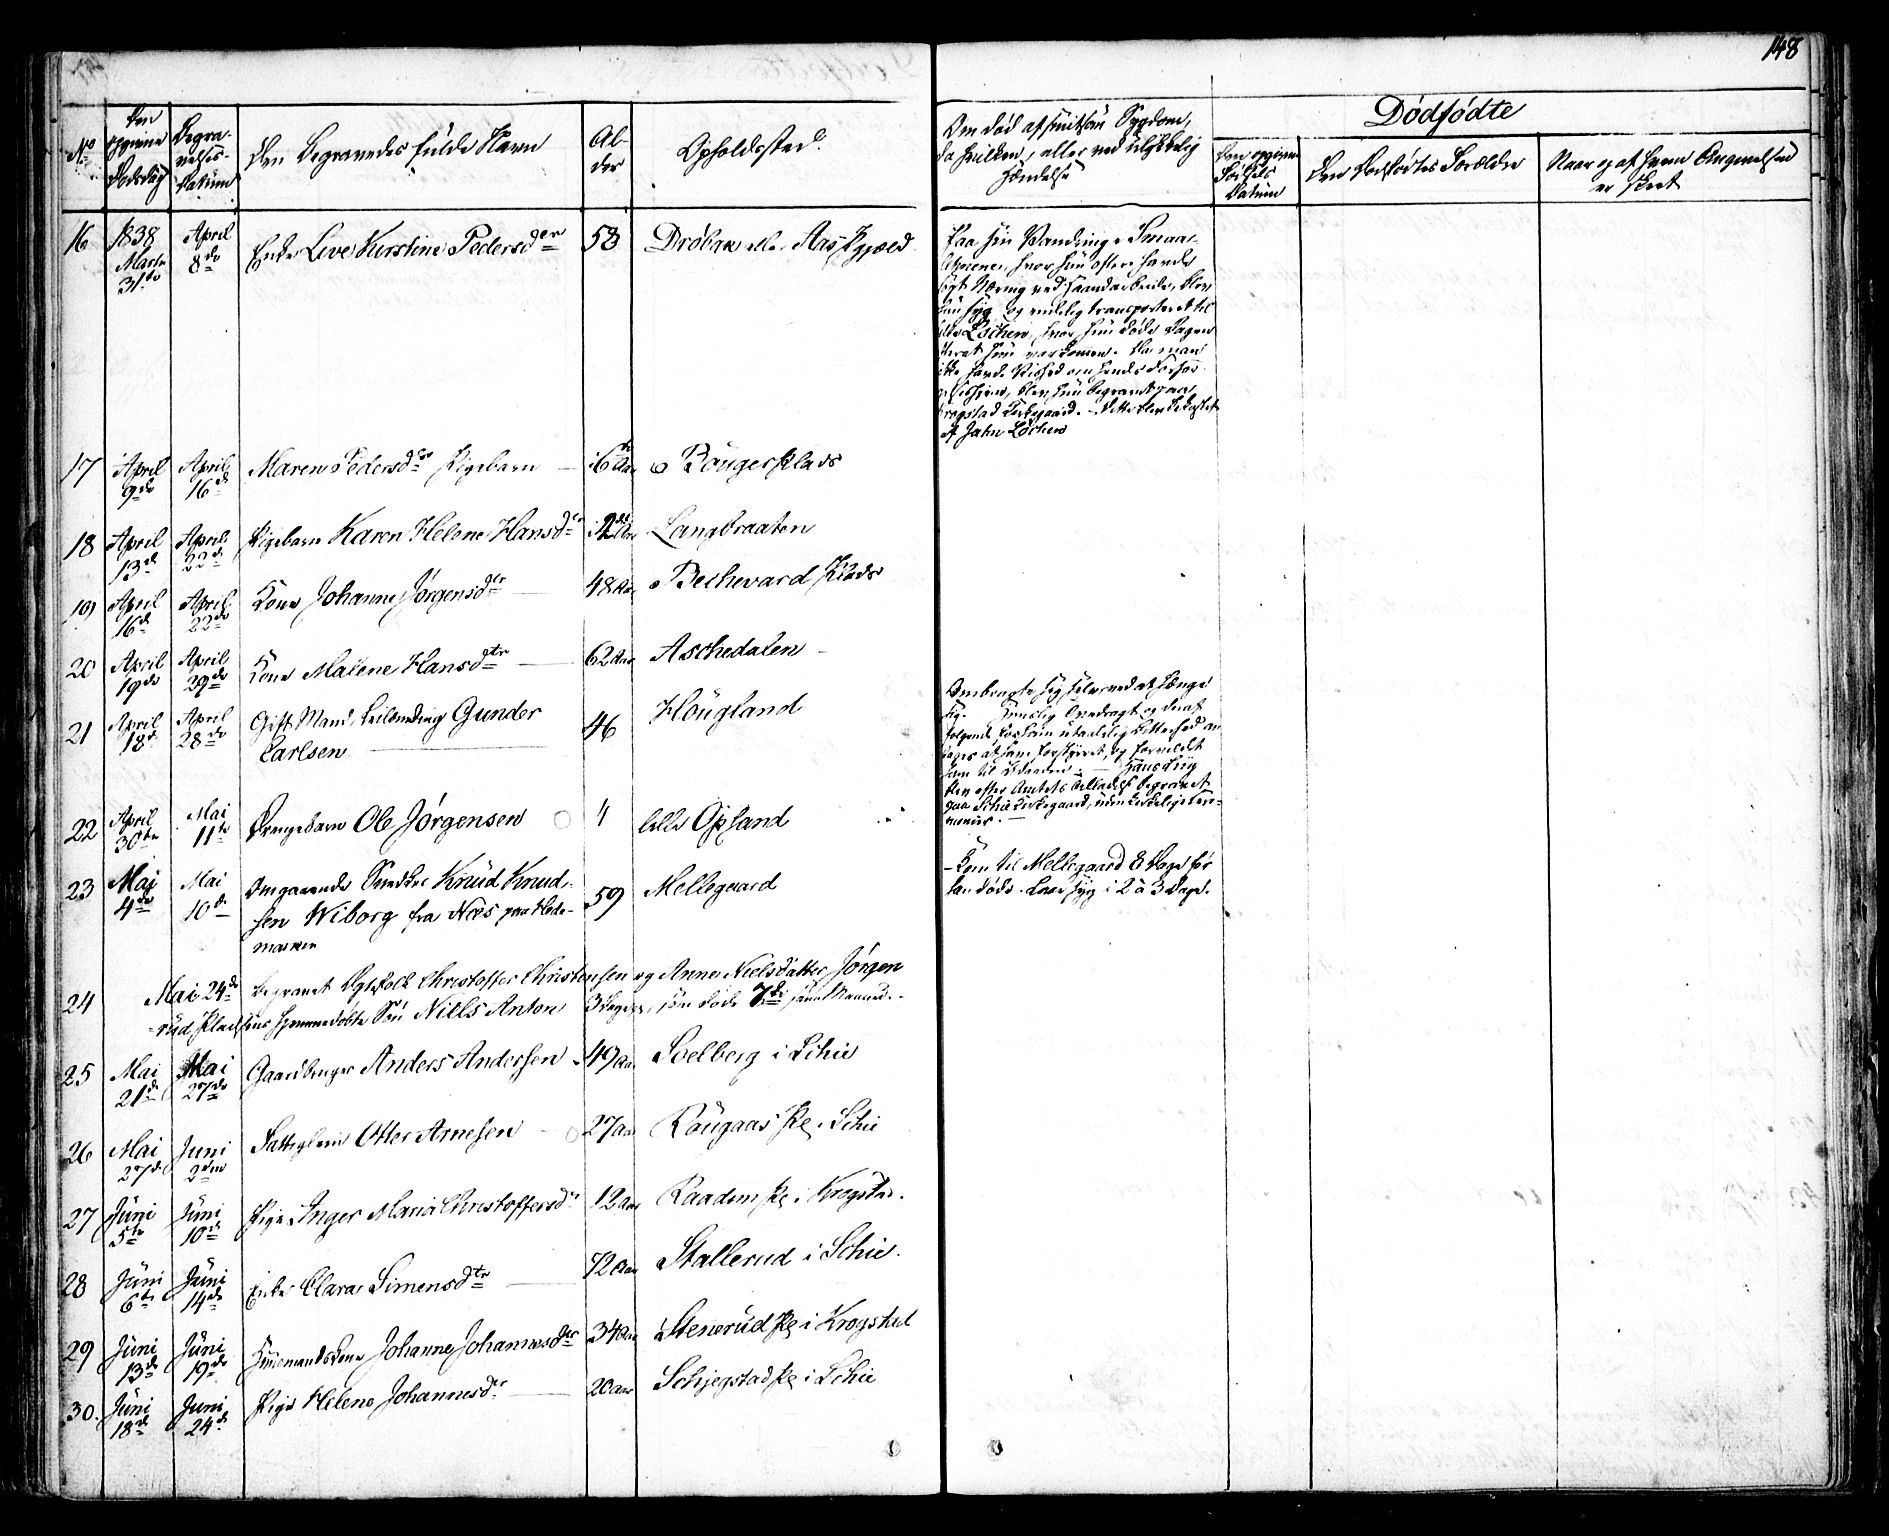 SAO, Kråkstad prestekontor Kirkebøker, F/Fa/L0005: Ministerialbok nr. I 5, 1837-1847, s. 148